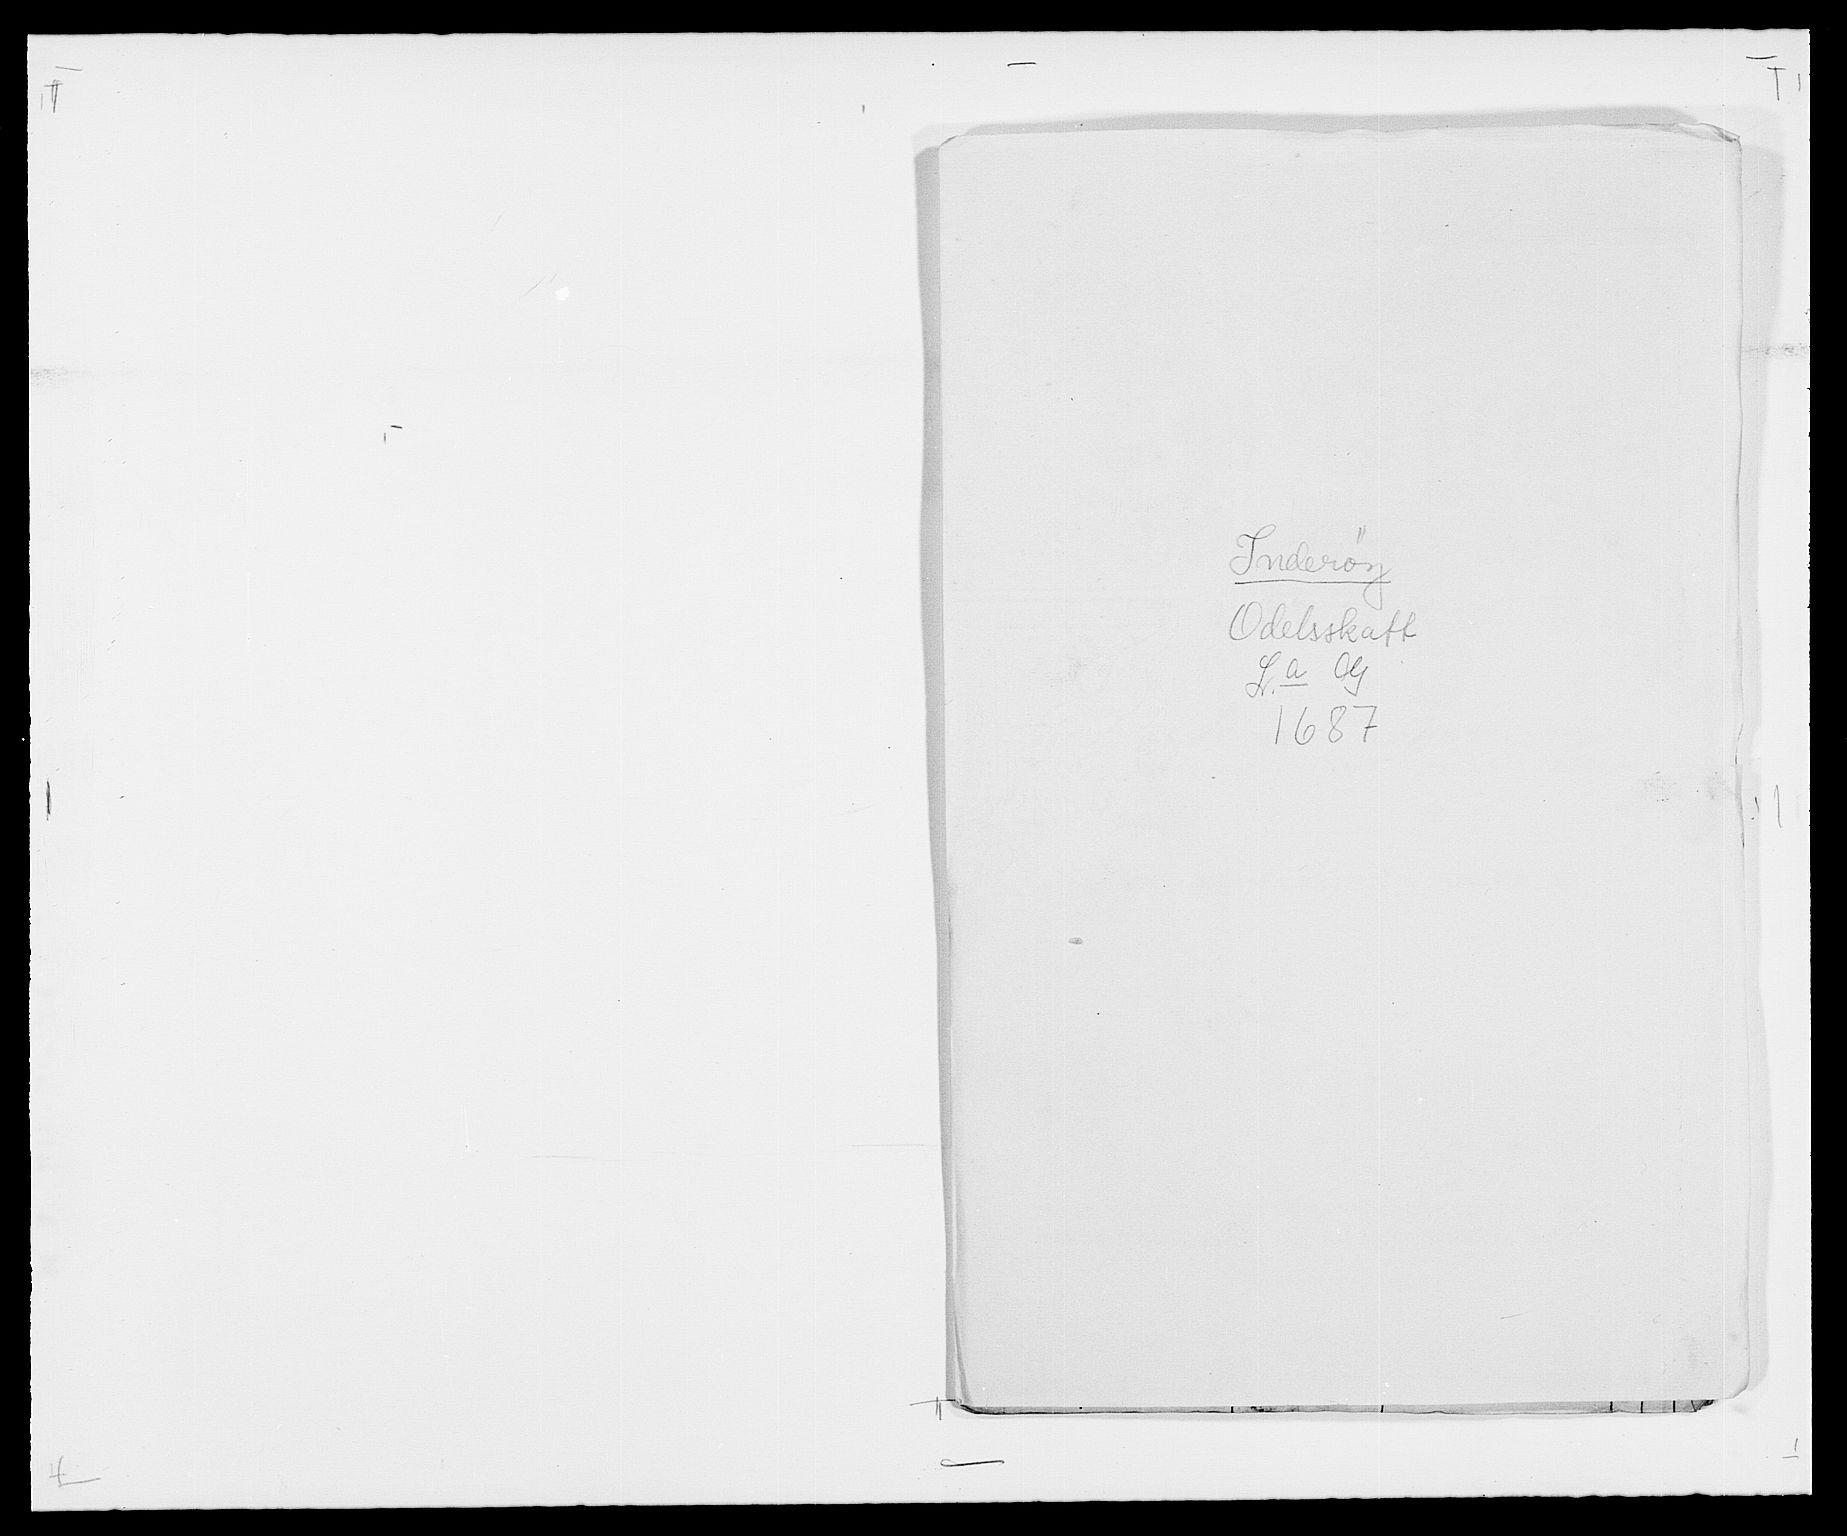 RA, Rentekammeret inntil 1814, Reviderte regnskaper, Fogderegnskap, R63/L4306: Fogderegnskap Inderøy, 1687-1689, s. 109